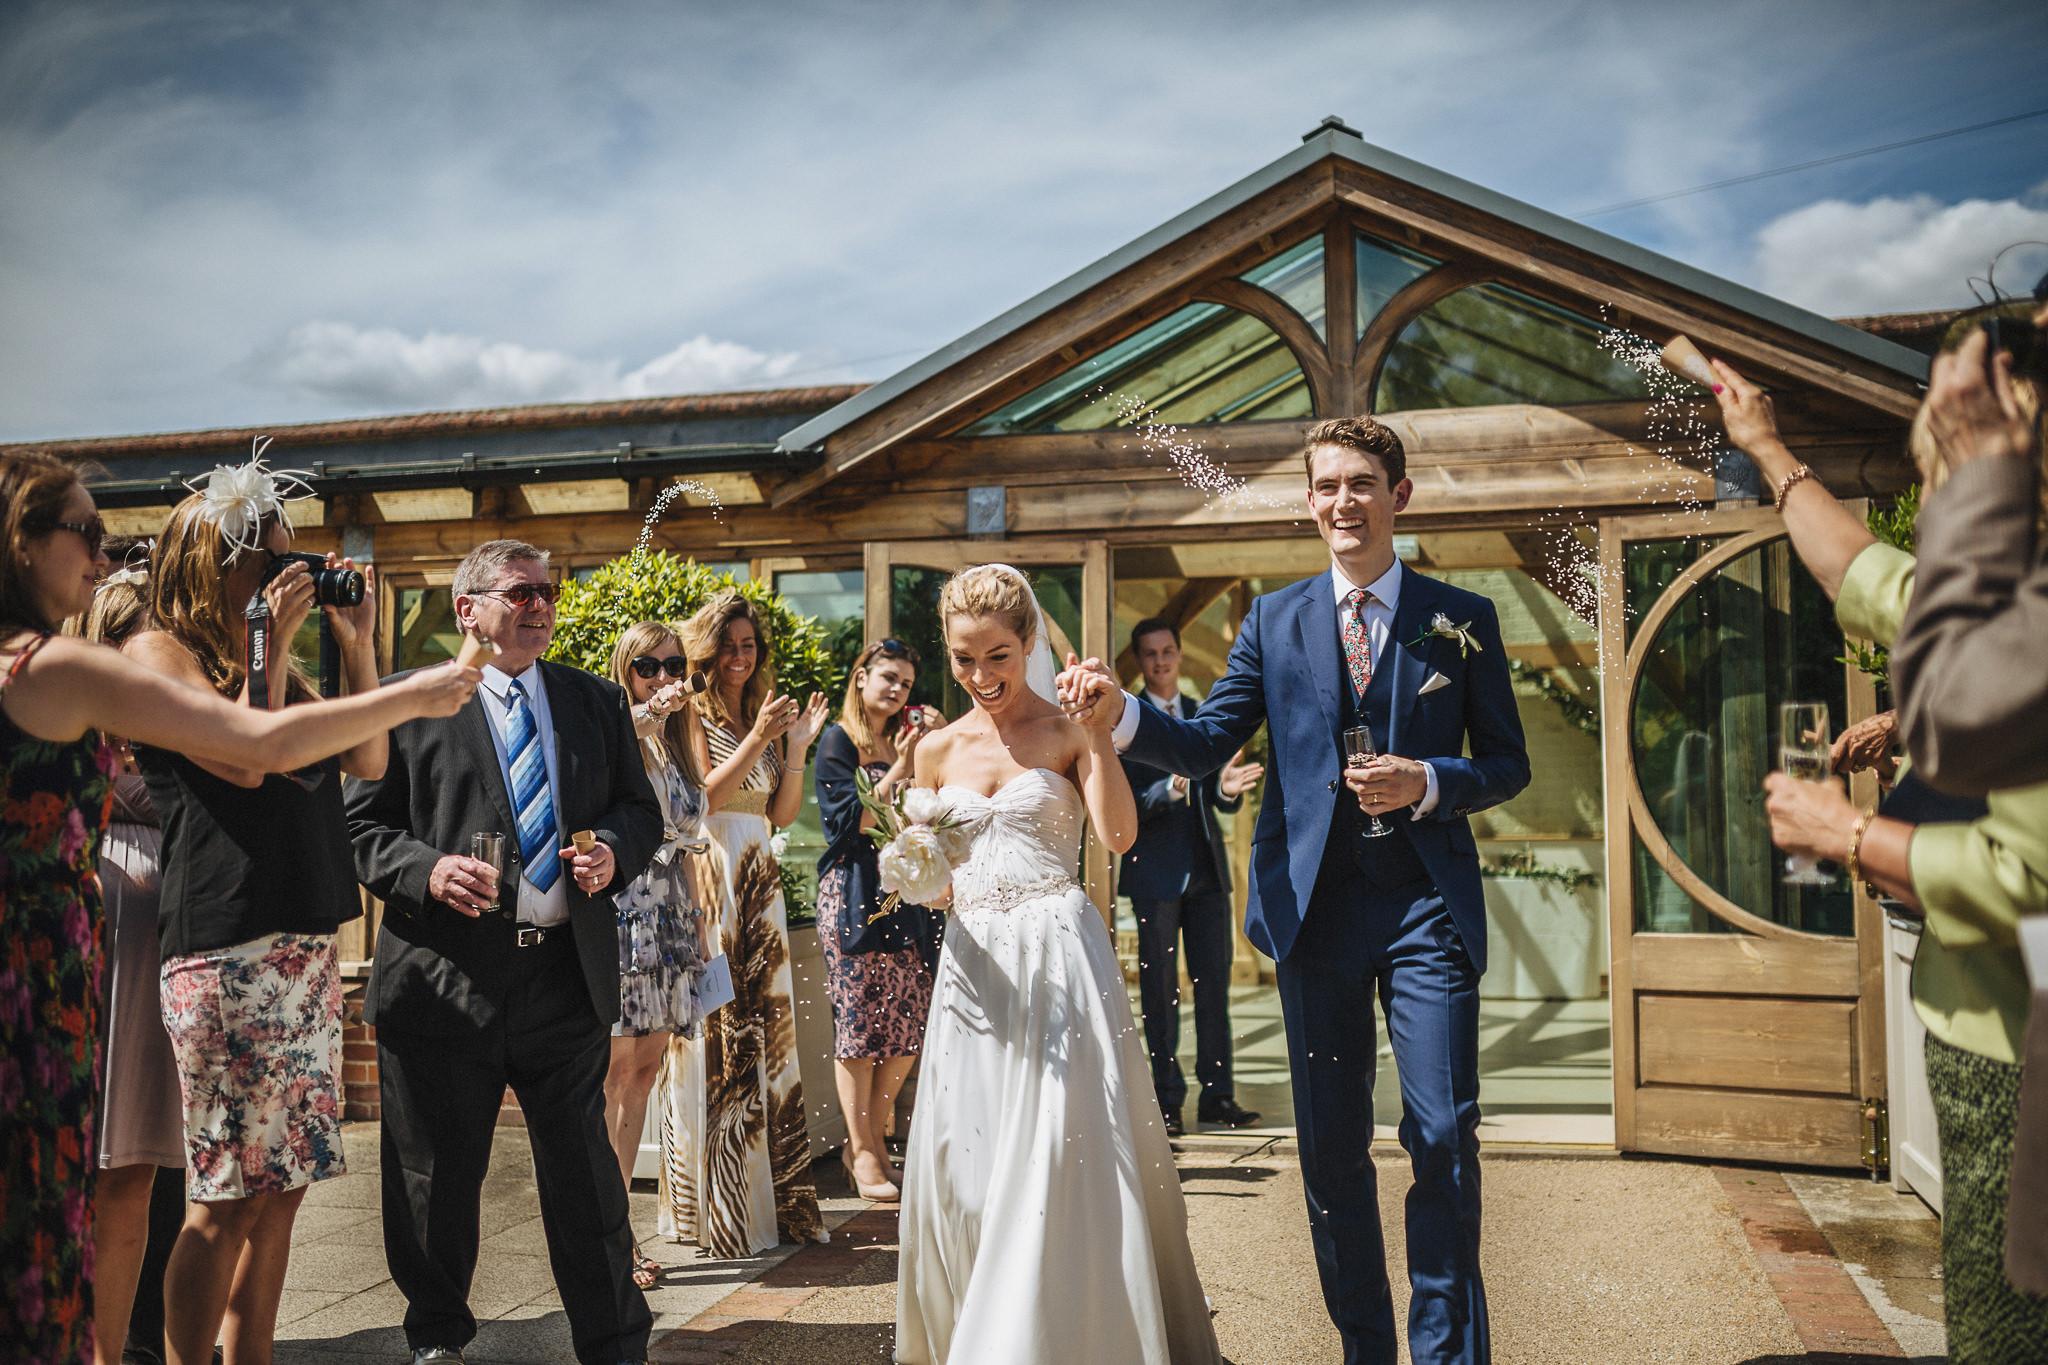 paul-marbrook-Gaynes-Park Wedding-Photographer-90060